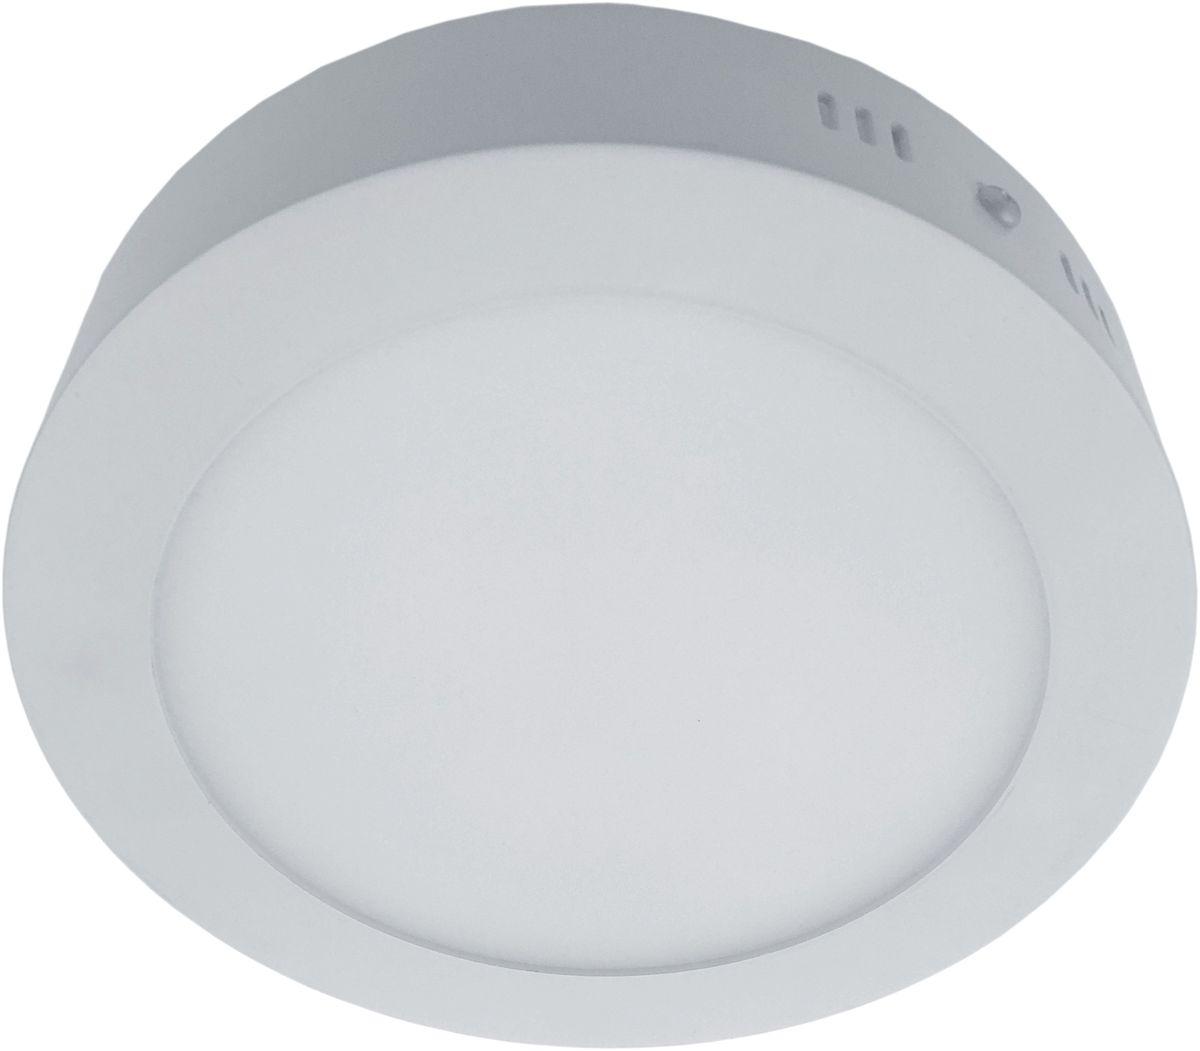 Светильник потолочный Arte Lamp ANGOLO A3012PL-1WHA3012PL-1WH